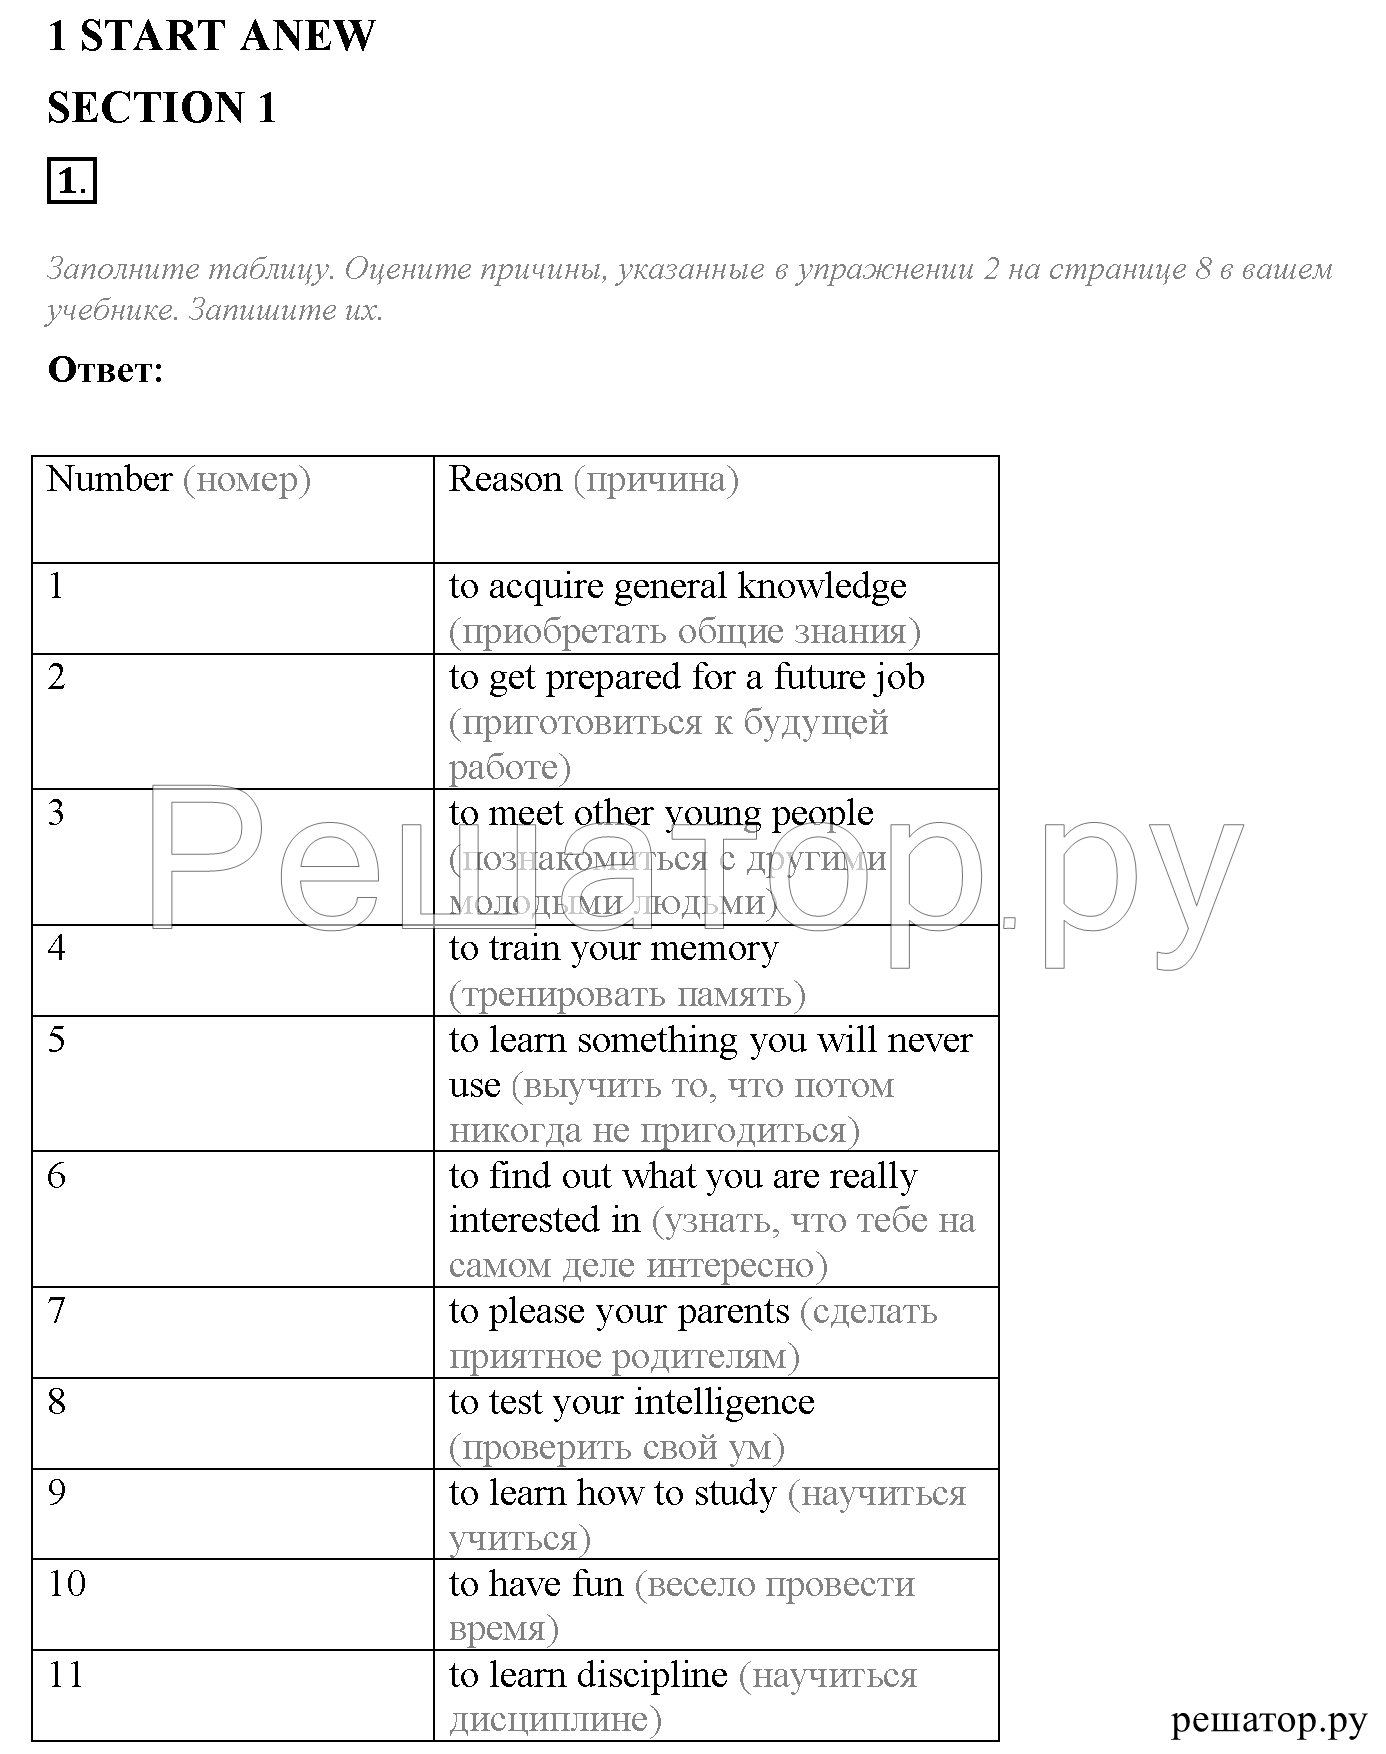 Unit 1. Start anew. Section 1: 1 - решение